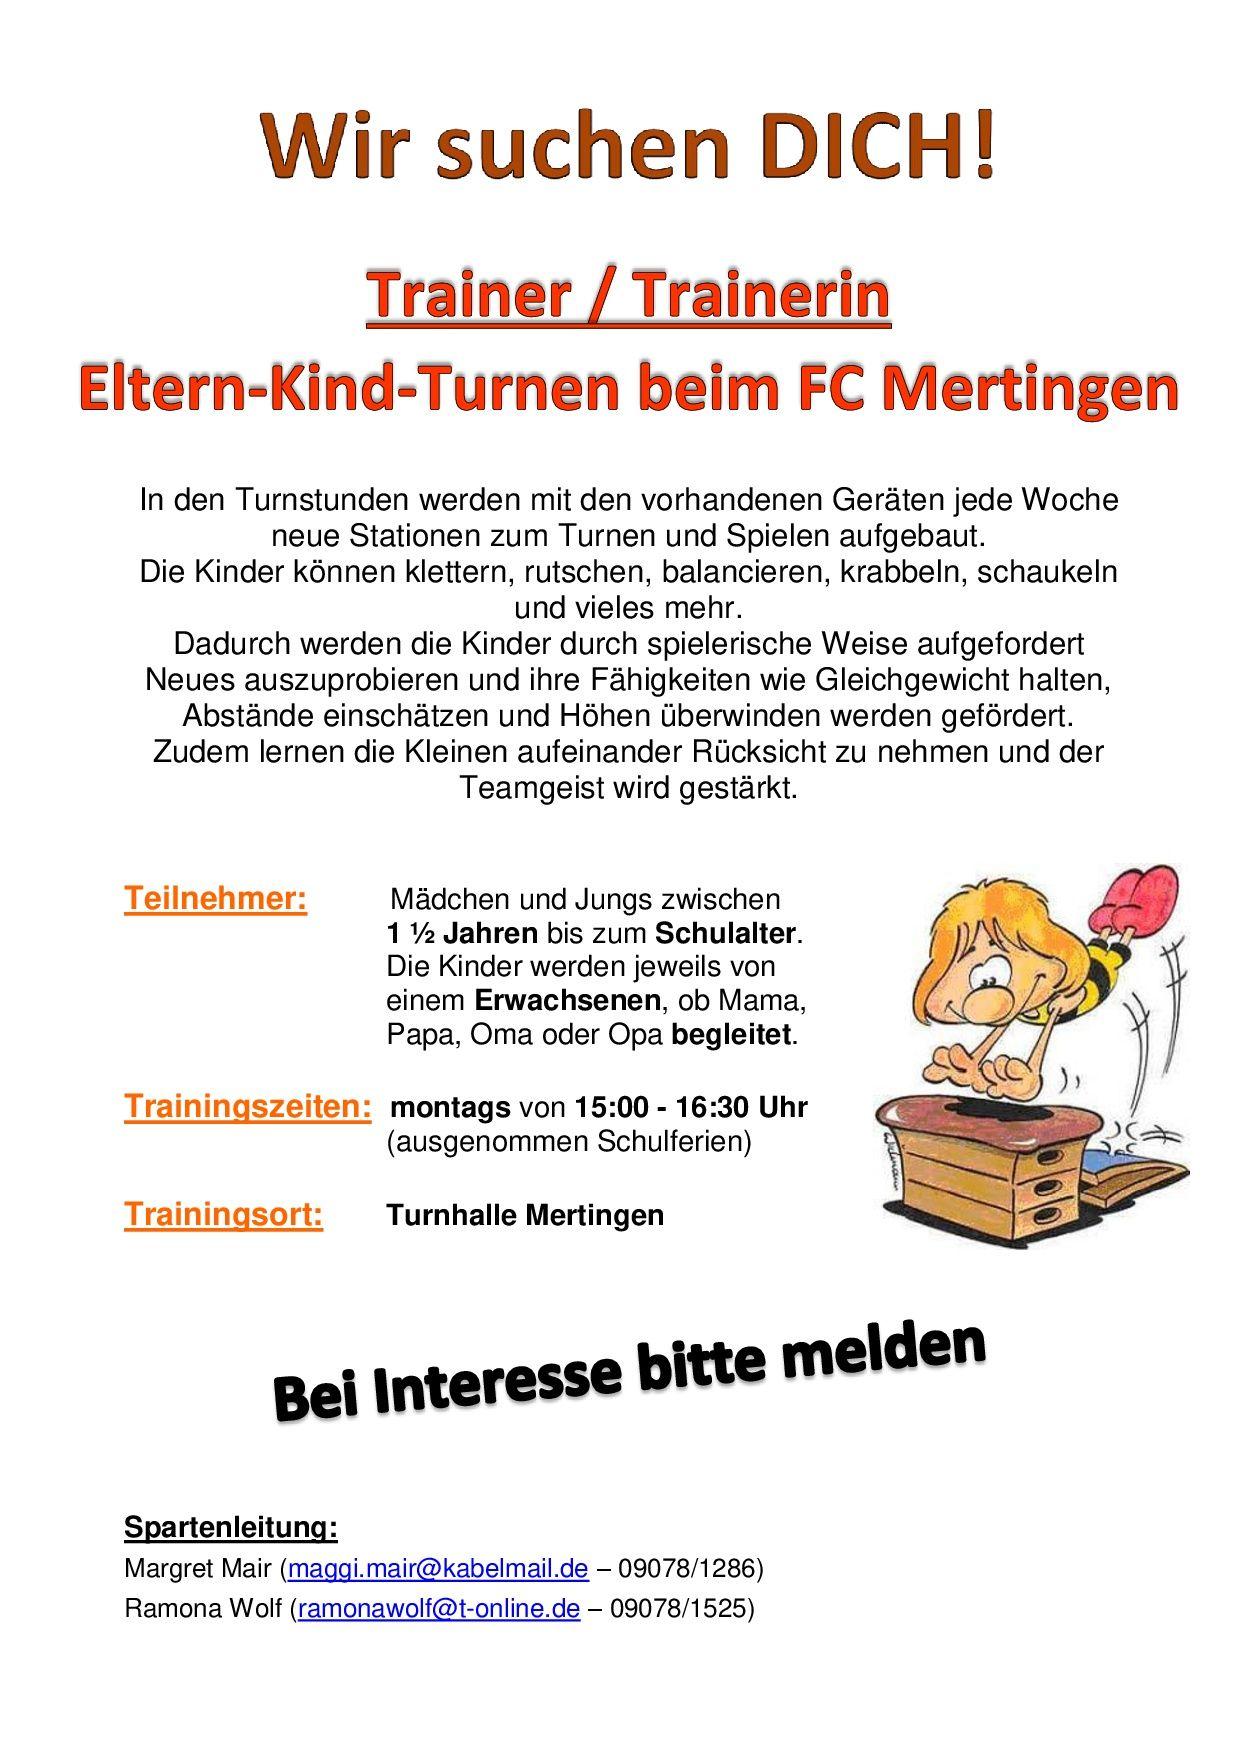 Mertingen sucht Trainer